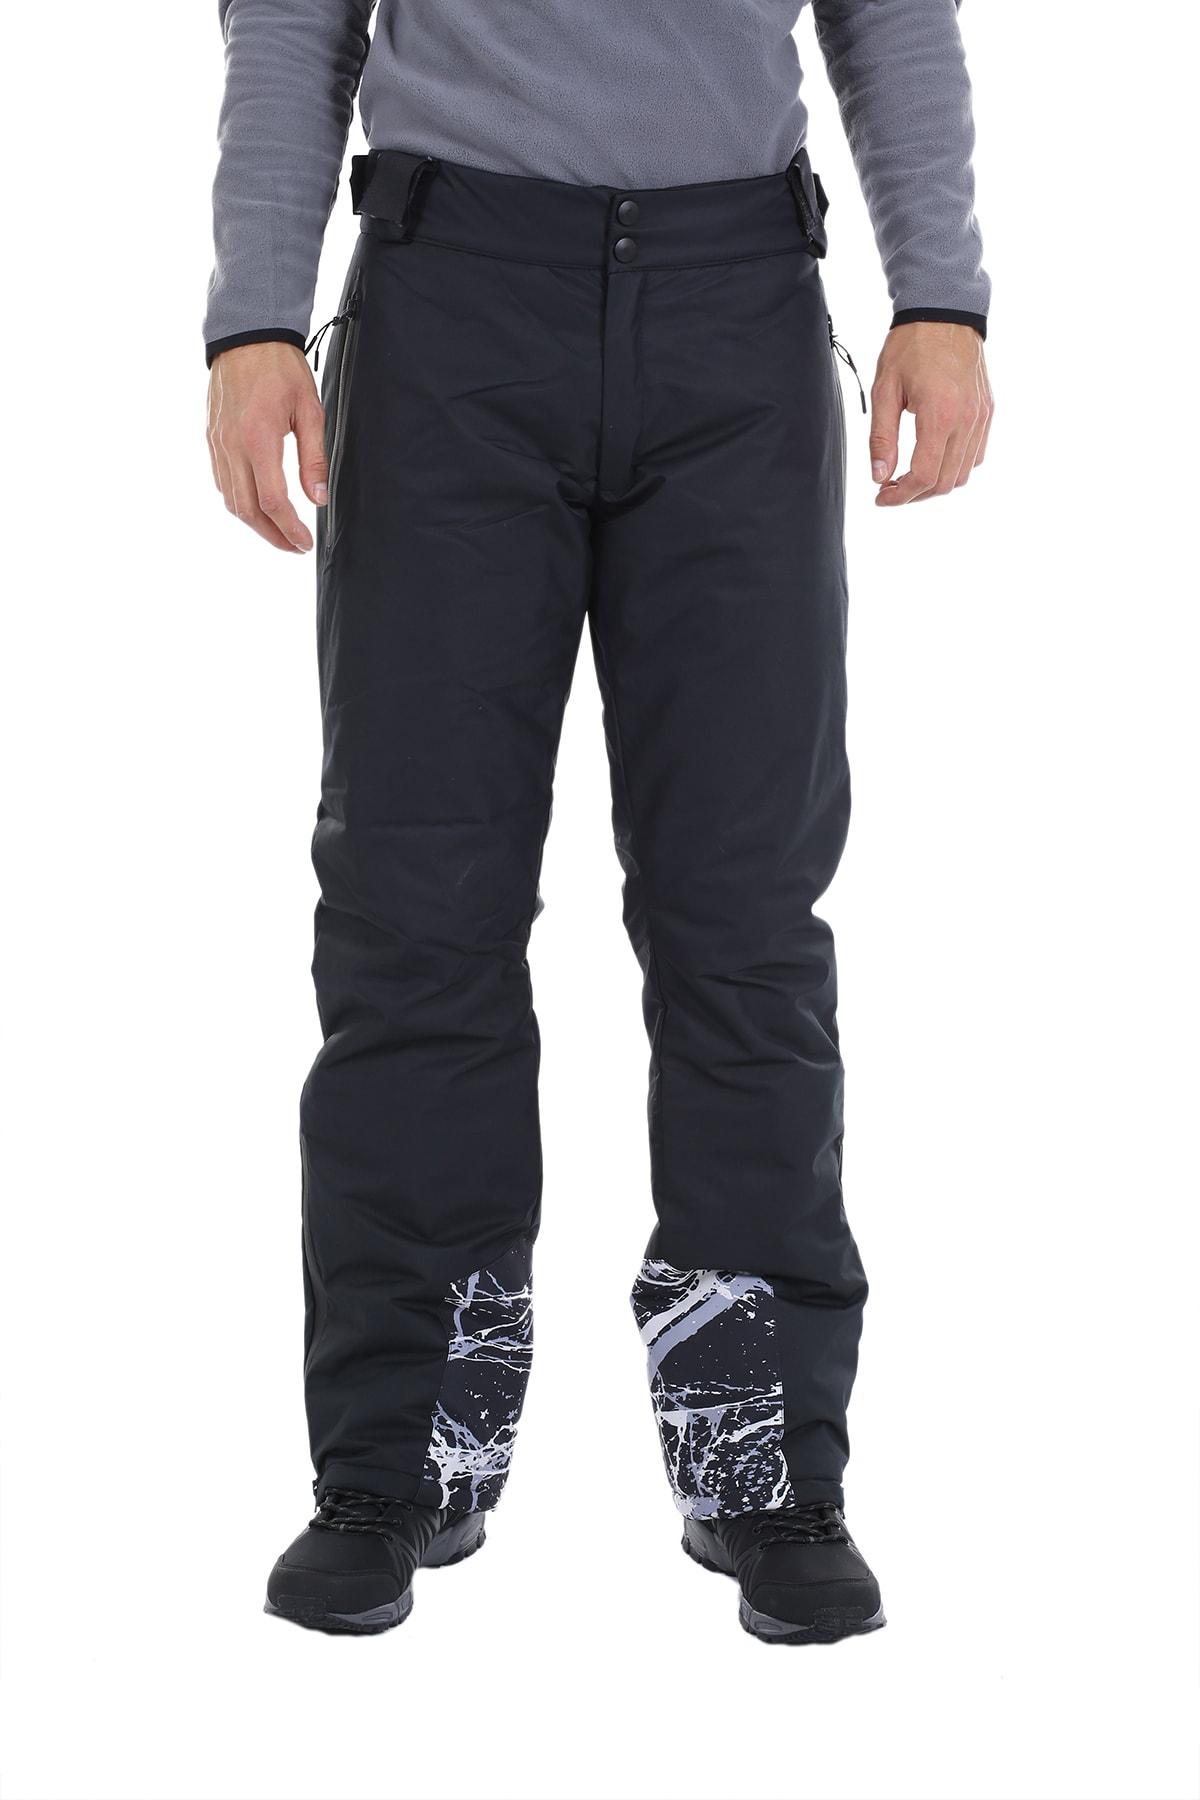 Exuma Erkek Siyah Kar Ve Kayak Pantolonu 2013131 10w342013131 1